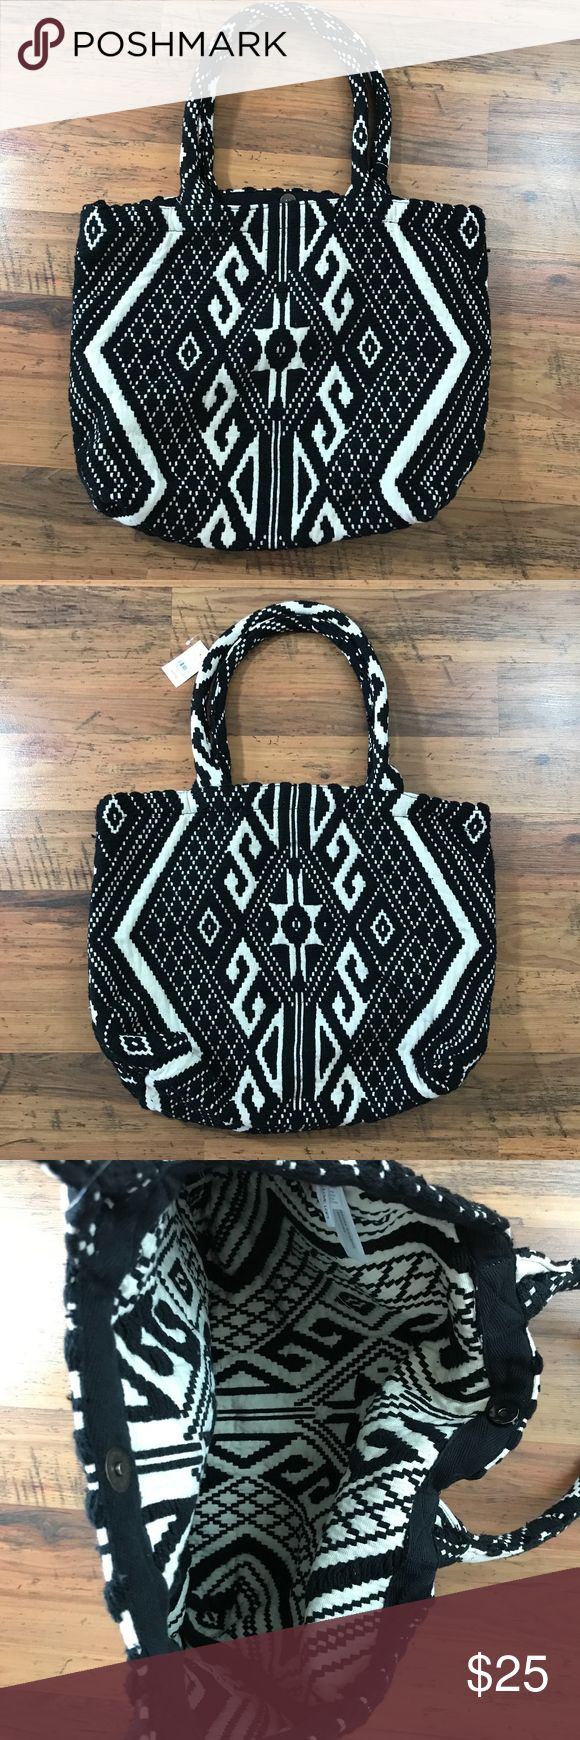 "Ann Taylor LOFT Black White Aztec Purse Bag NWT Ann Taylor LOFT Black White Aztec Purse Bag NEW! 18.8"" x 15.5"" LOFT Bags"